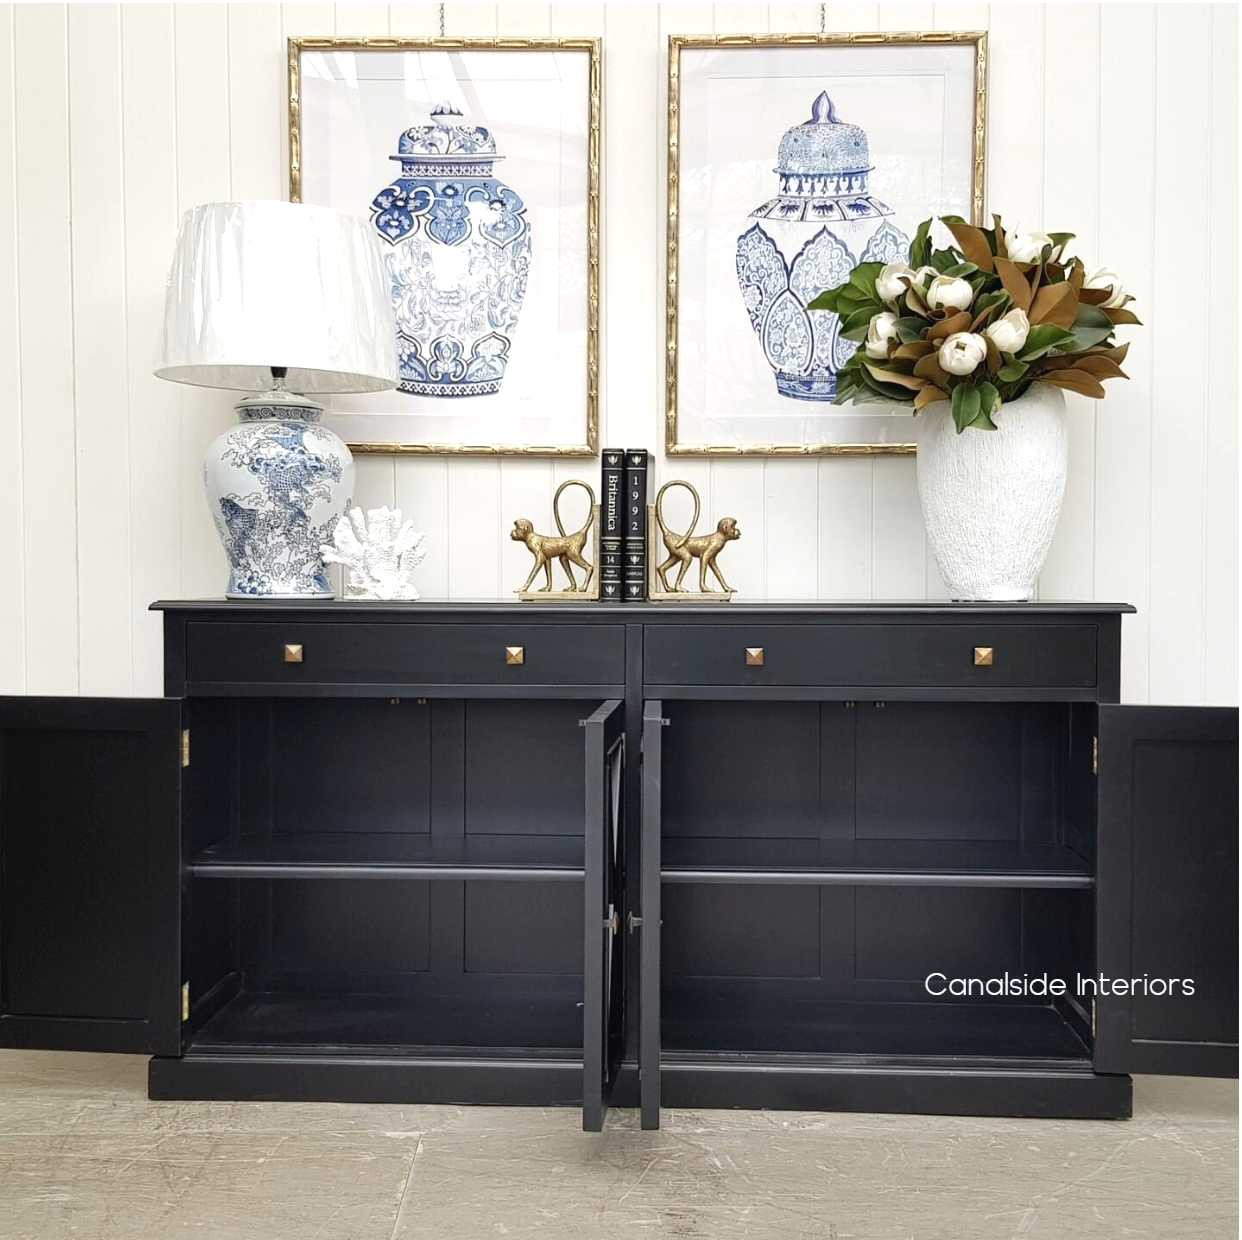 Picture of: Hamptons Furniture Sydney Canalside Interiors Alexandria